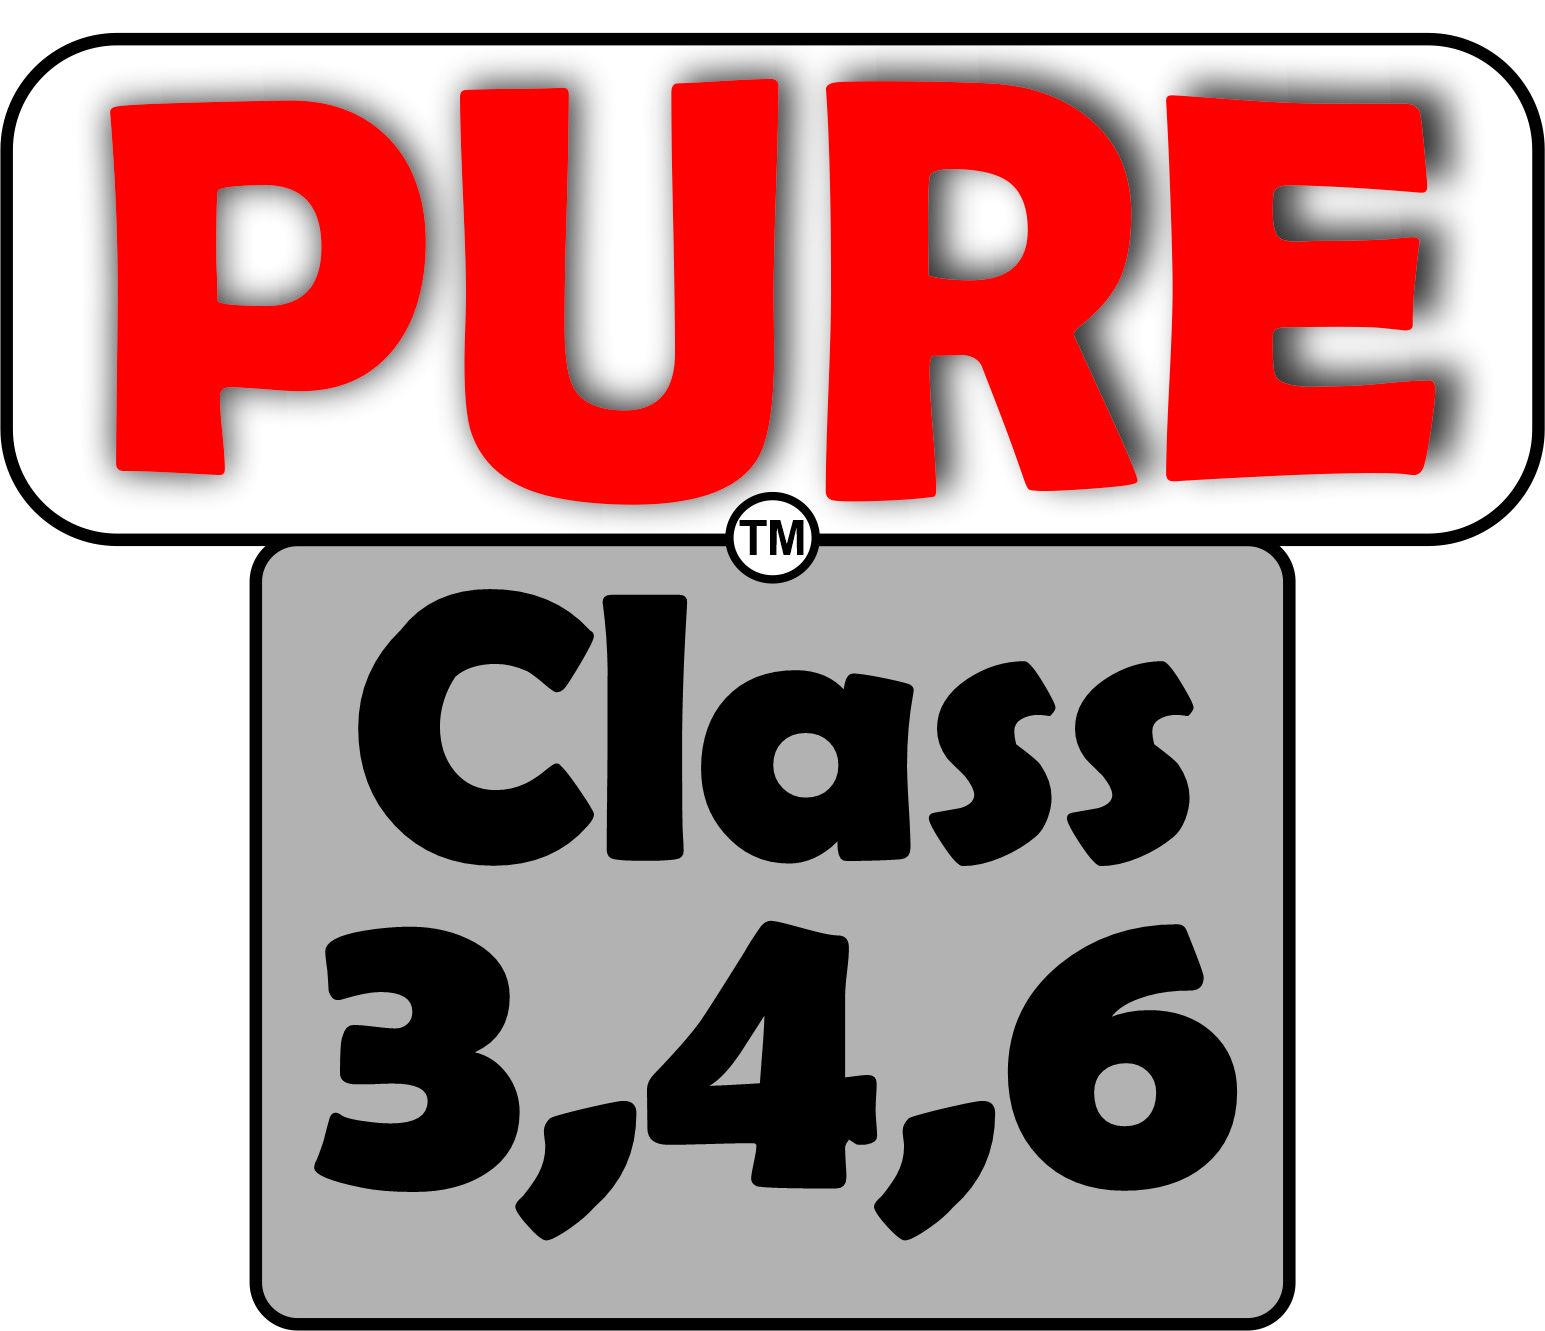 19-PURE-CLASSES-2020-CL3,4,6-Nov13.jpg